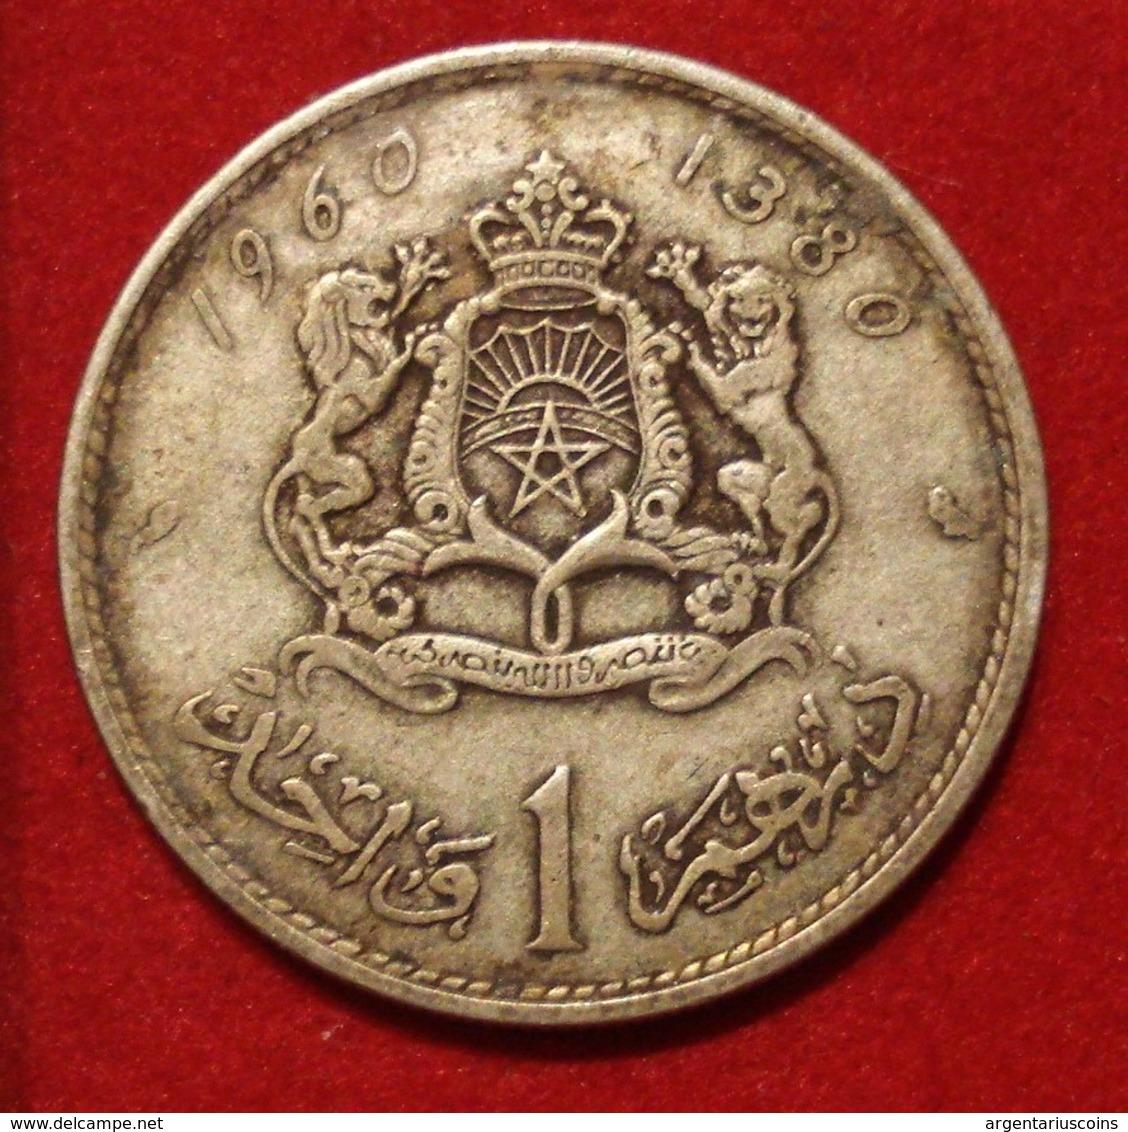 MAROC. 1 DIRHAM 1960. ARGENT.  SILVER. MOROCCO. - Maroc